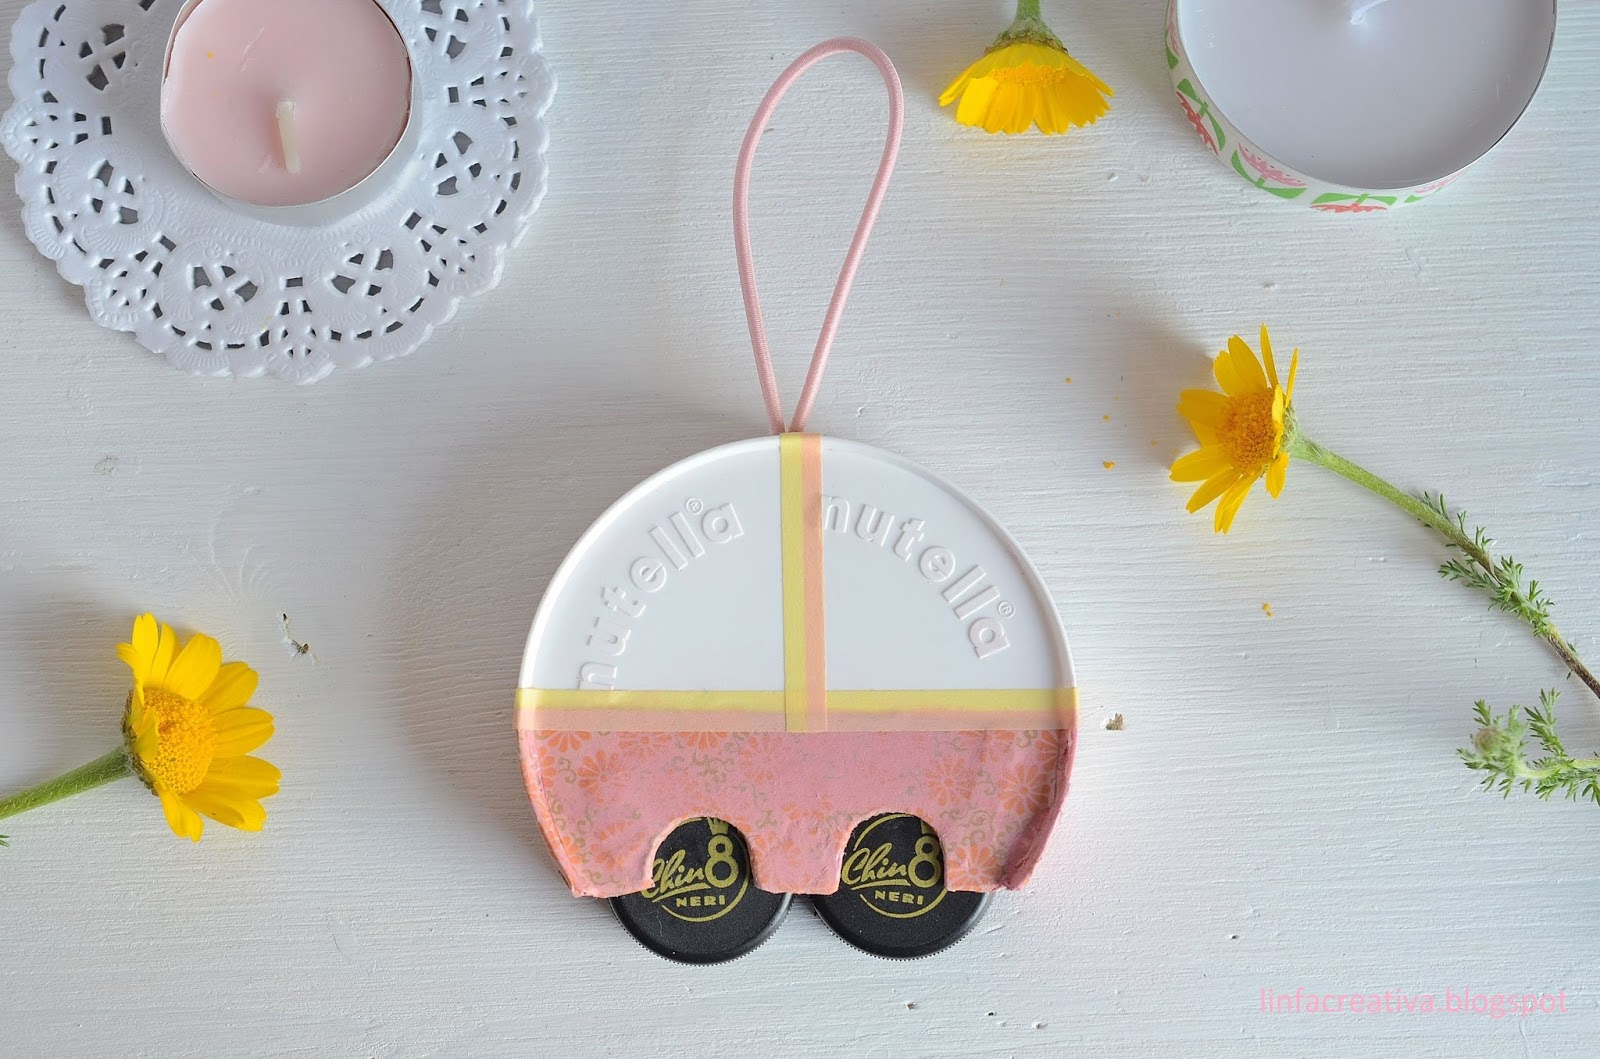 riciclo creativo: mini caravan